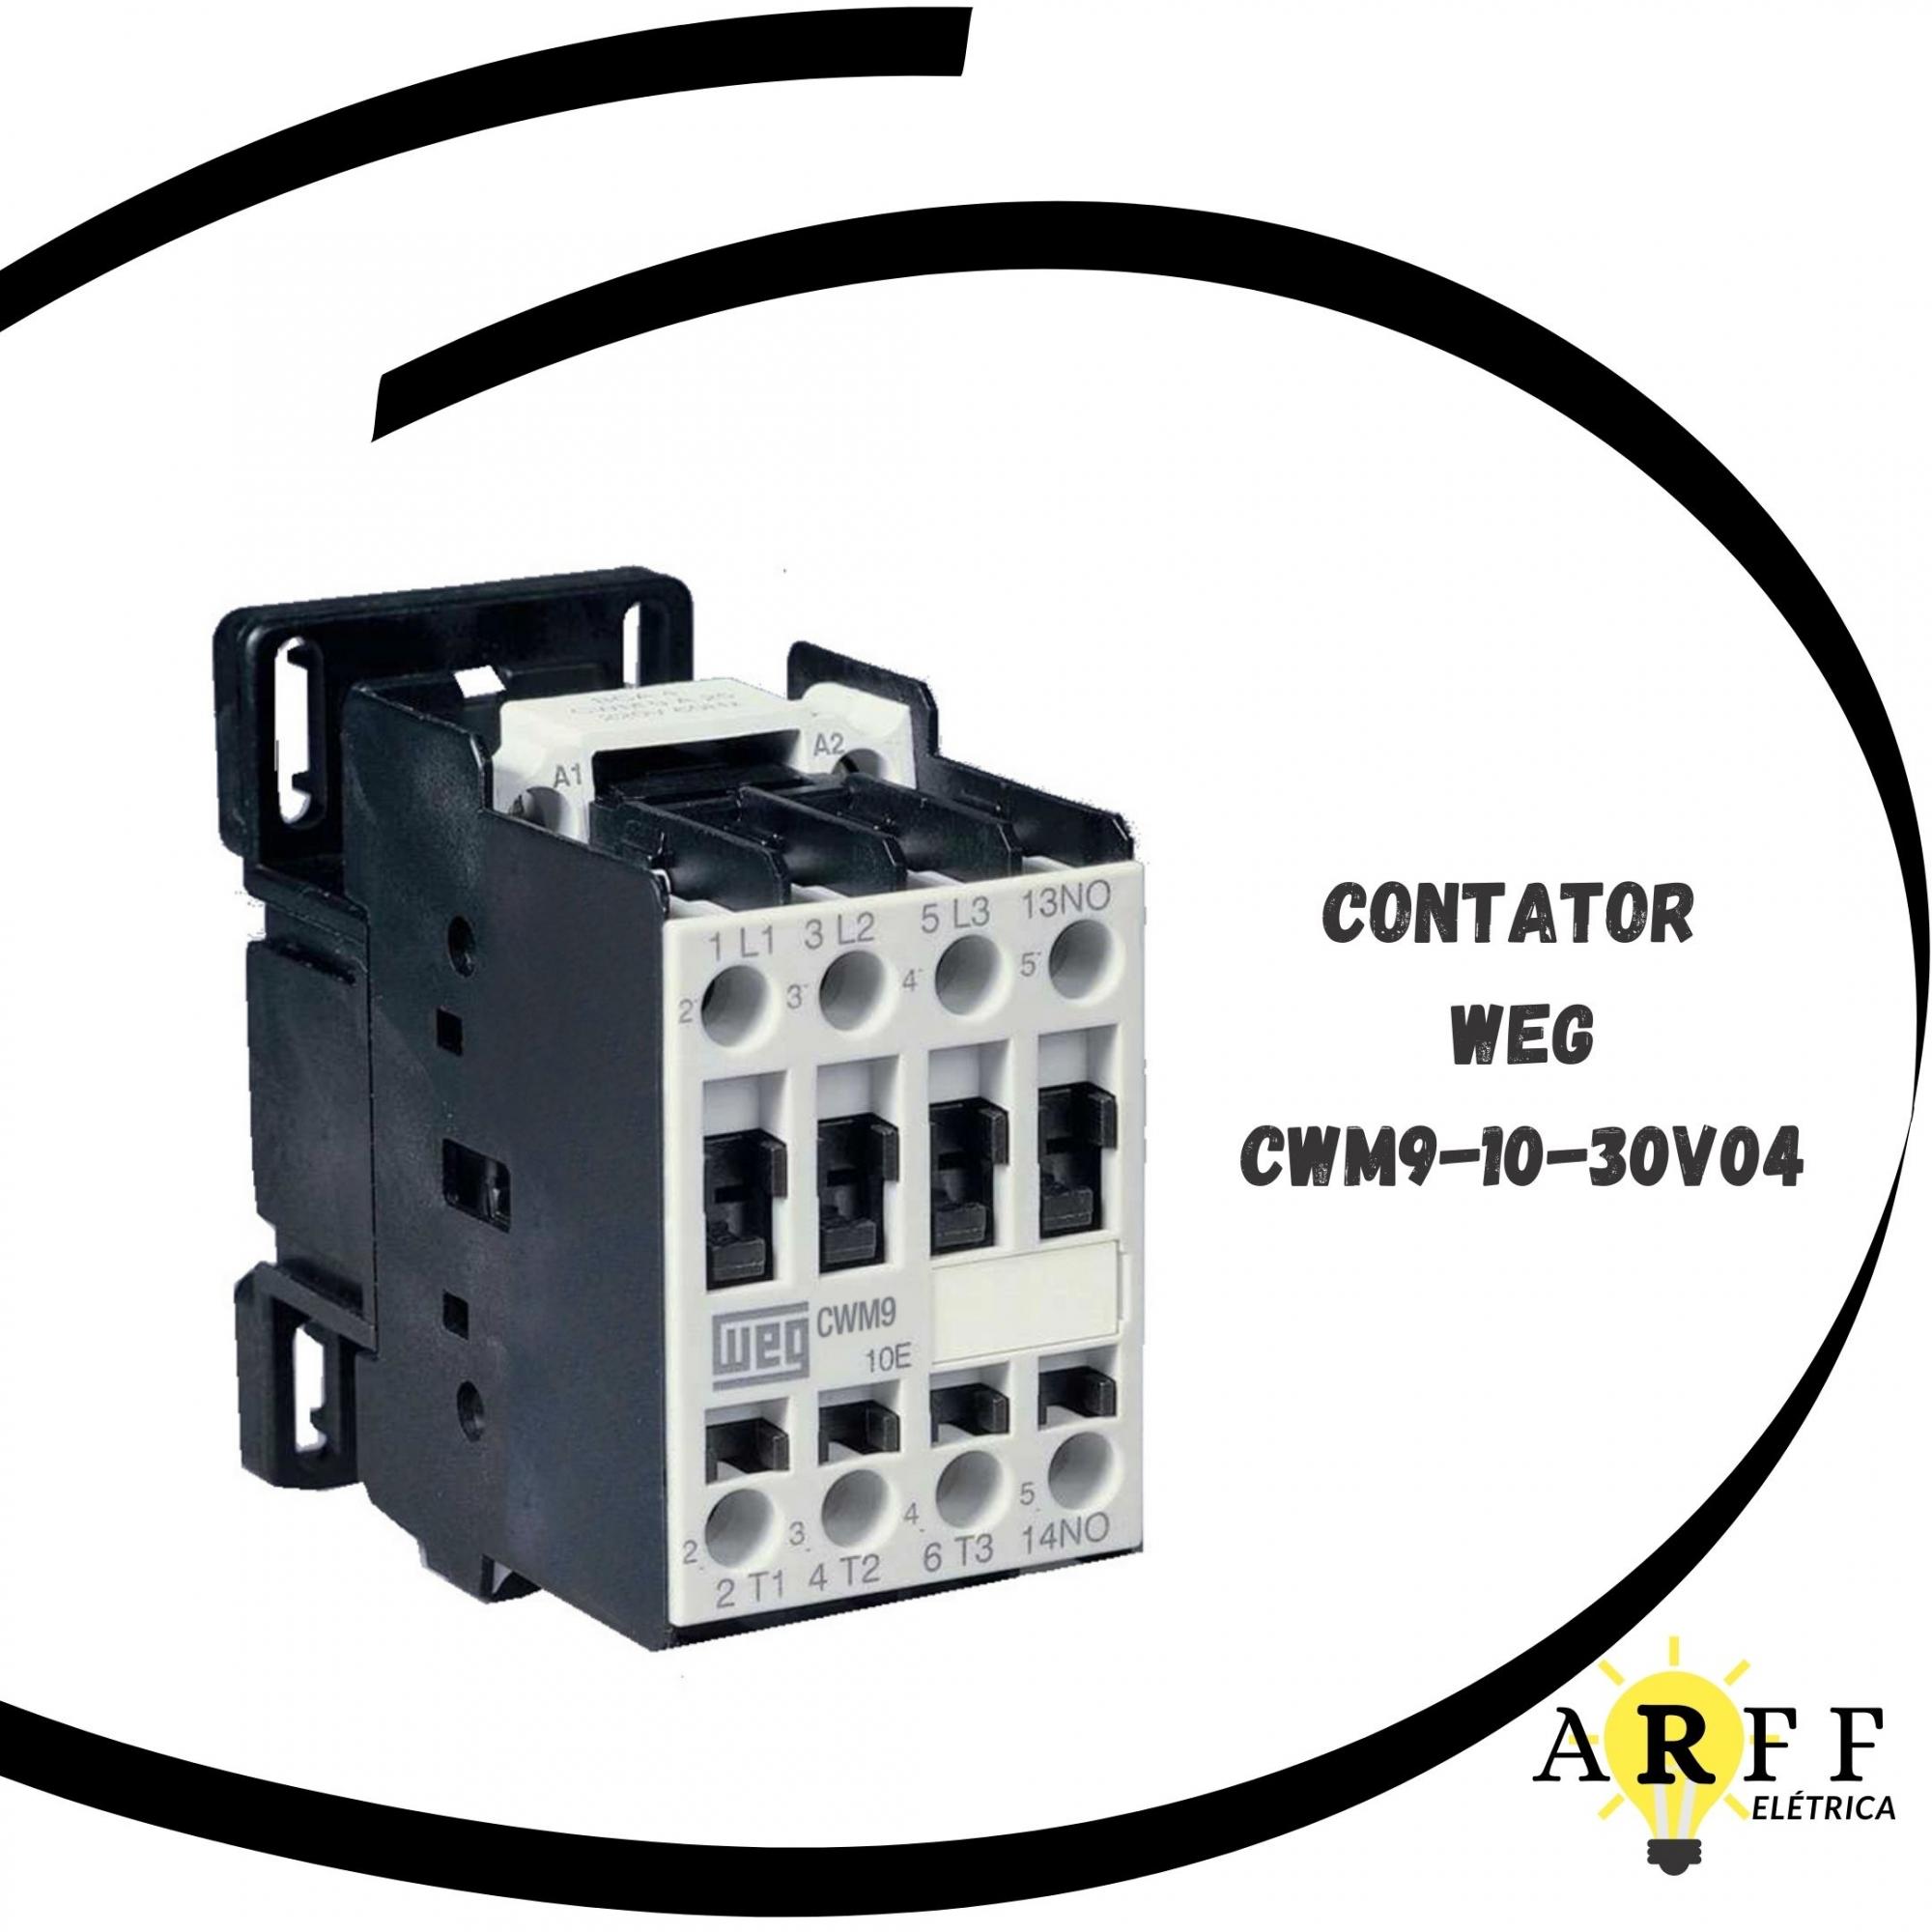 CONTATOR TRIPOLAR WEG MODELO CWM9-10-30V04